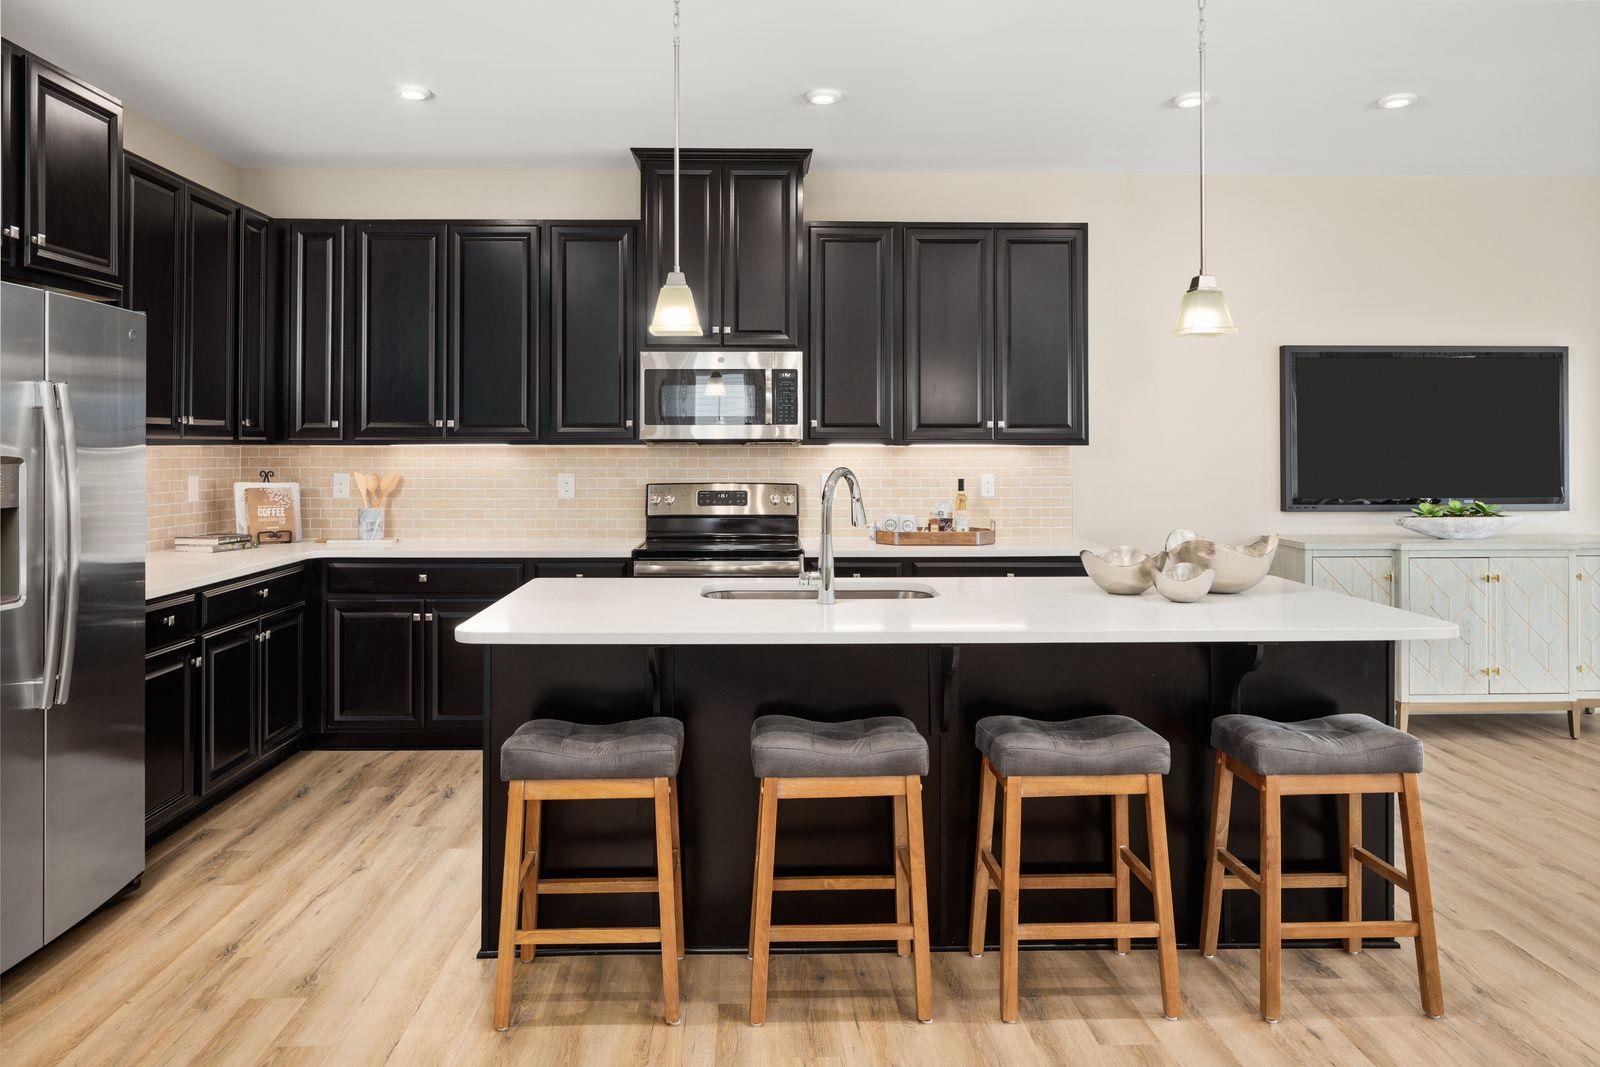 Kitchen featured in the Roxbury Grande By Ryan Homes in Norfolk-Newport News, VA